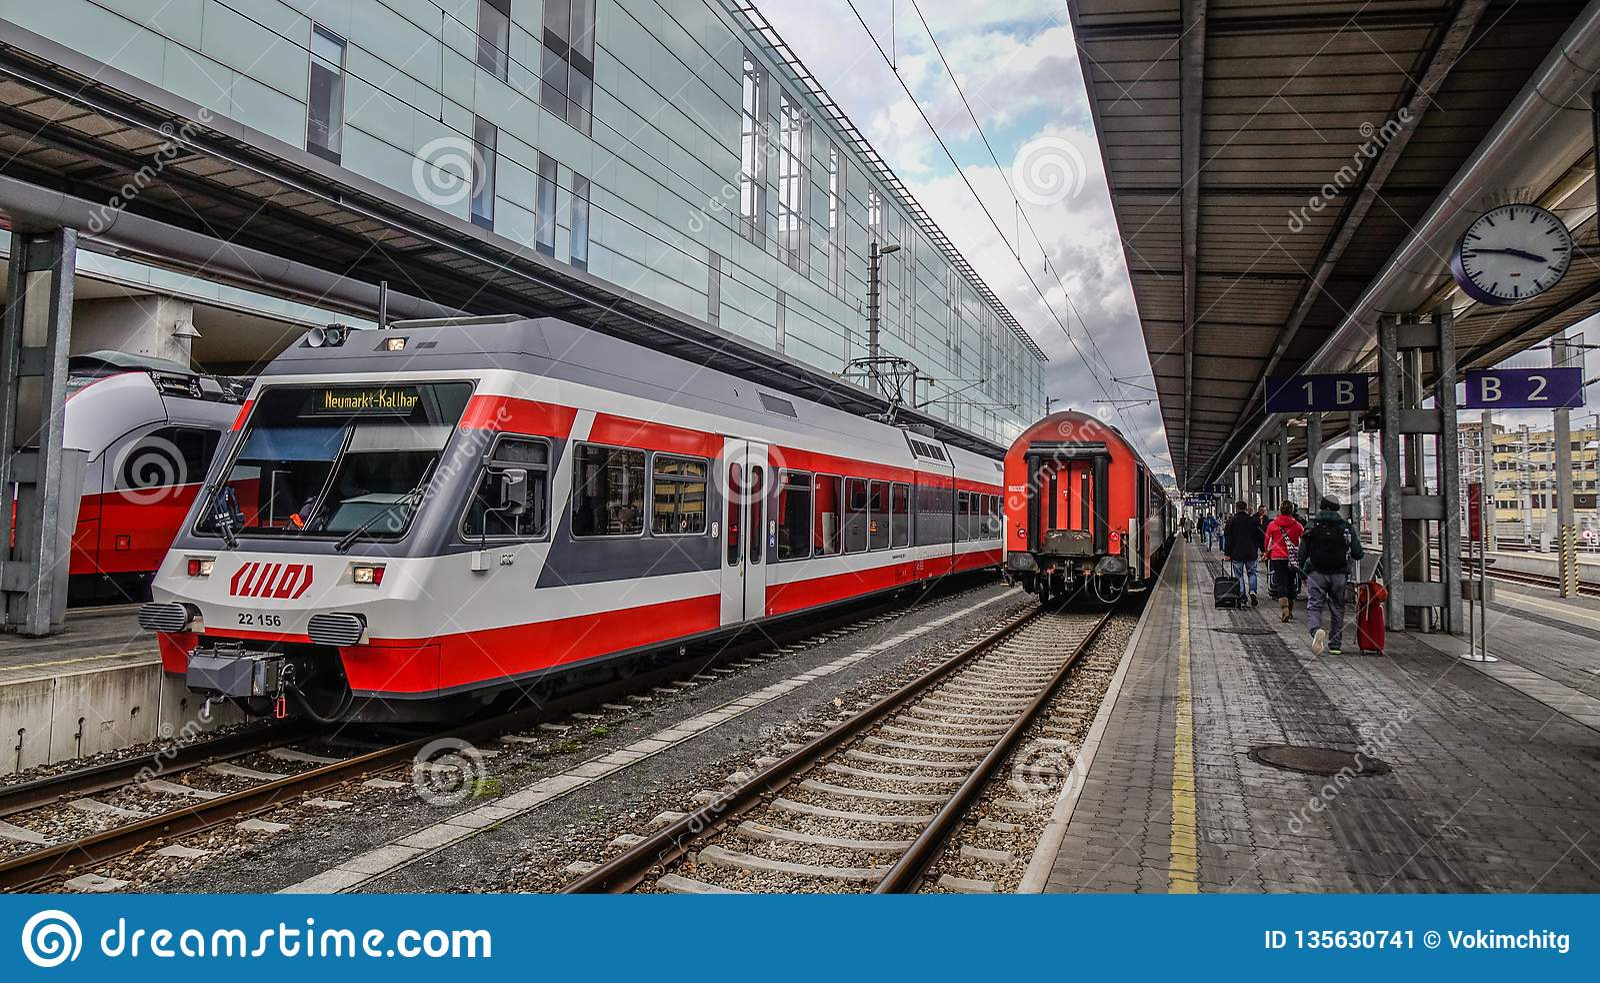 Trains at railway station in Linz, Austria